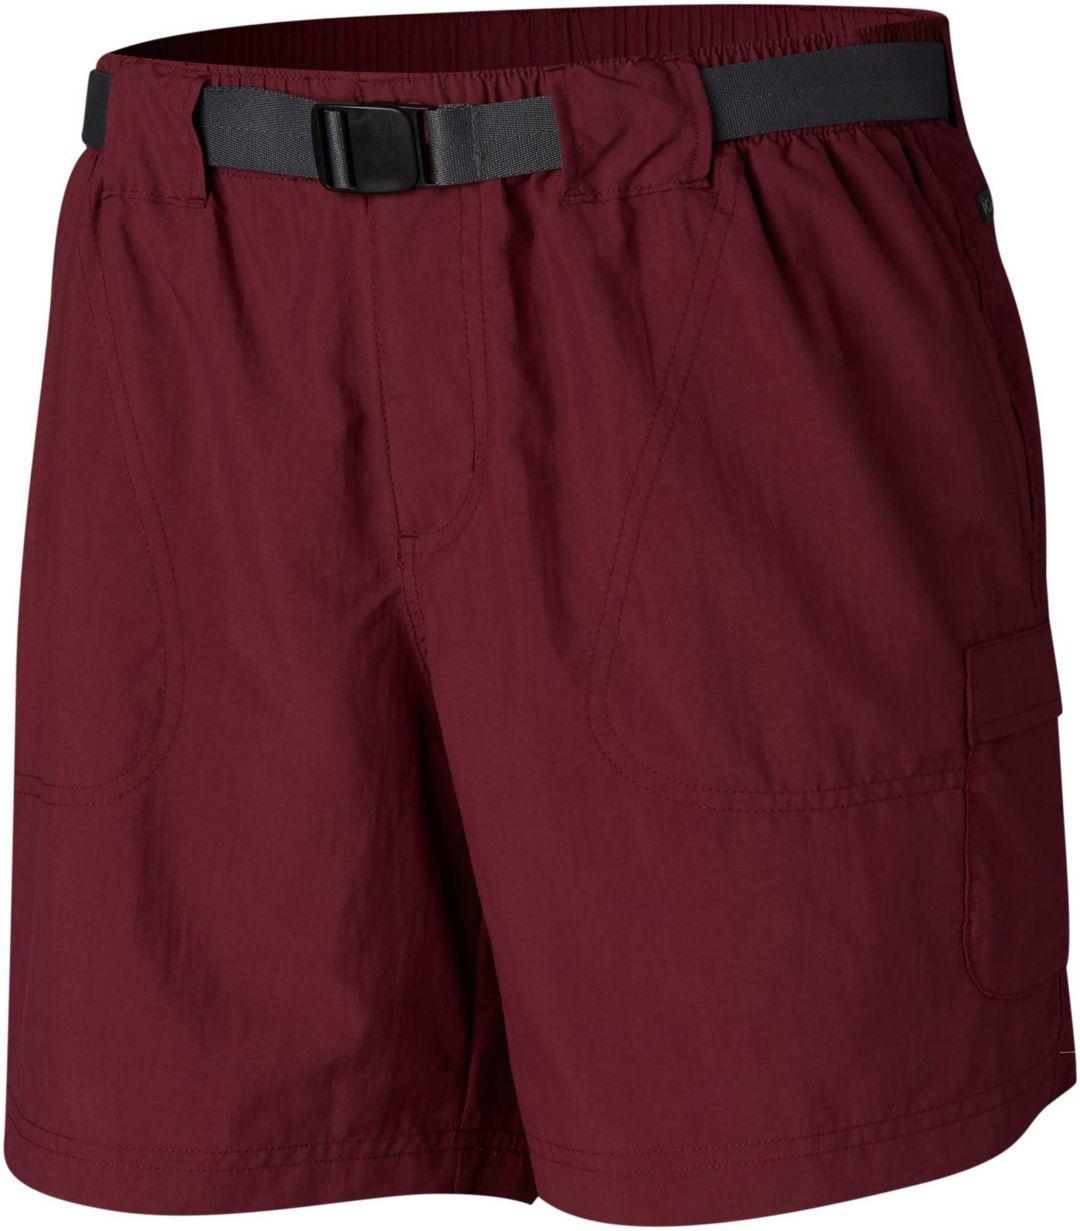 9eadc5a7c8b Columbia Women's Sandy River Cargo Shorts | DICK'S Sporting Goods